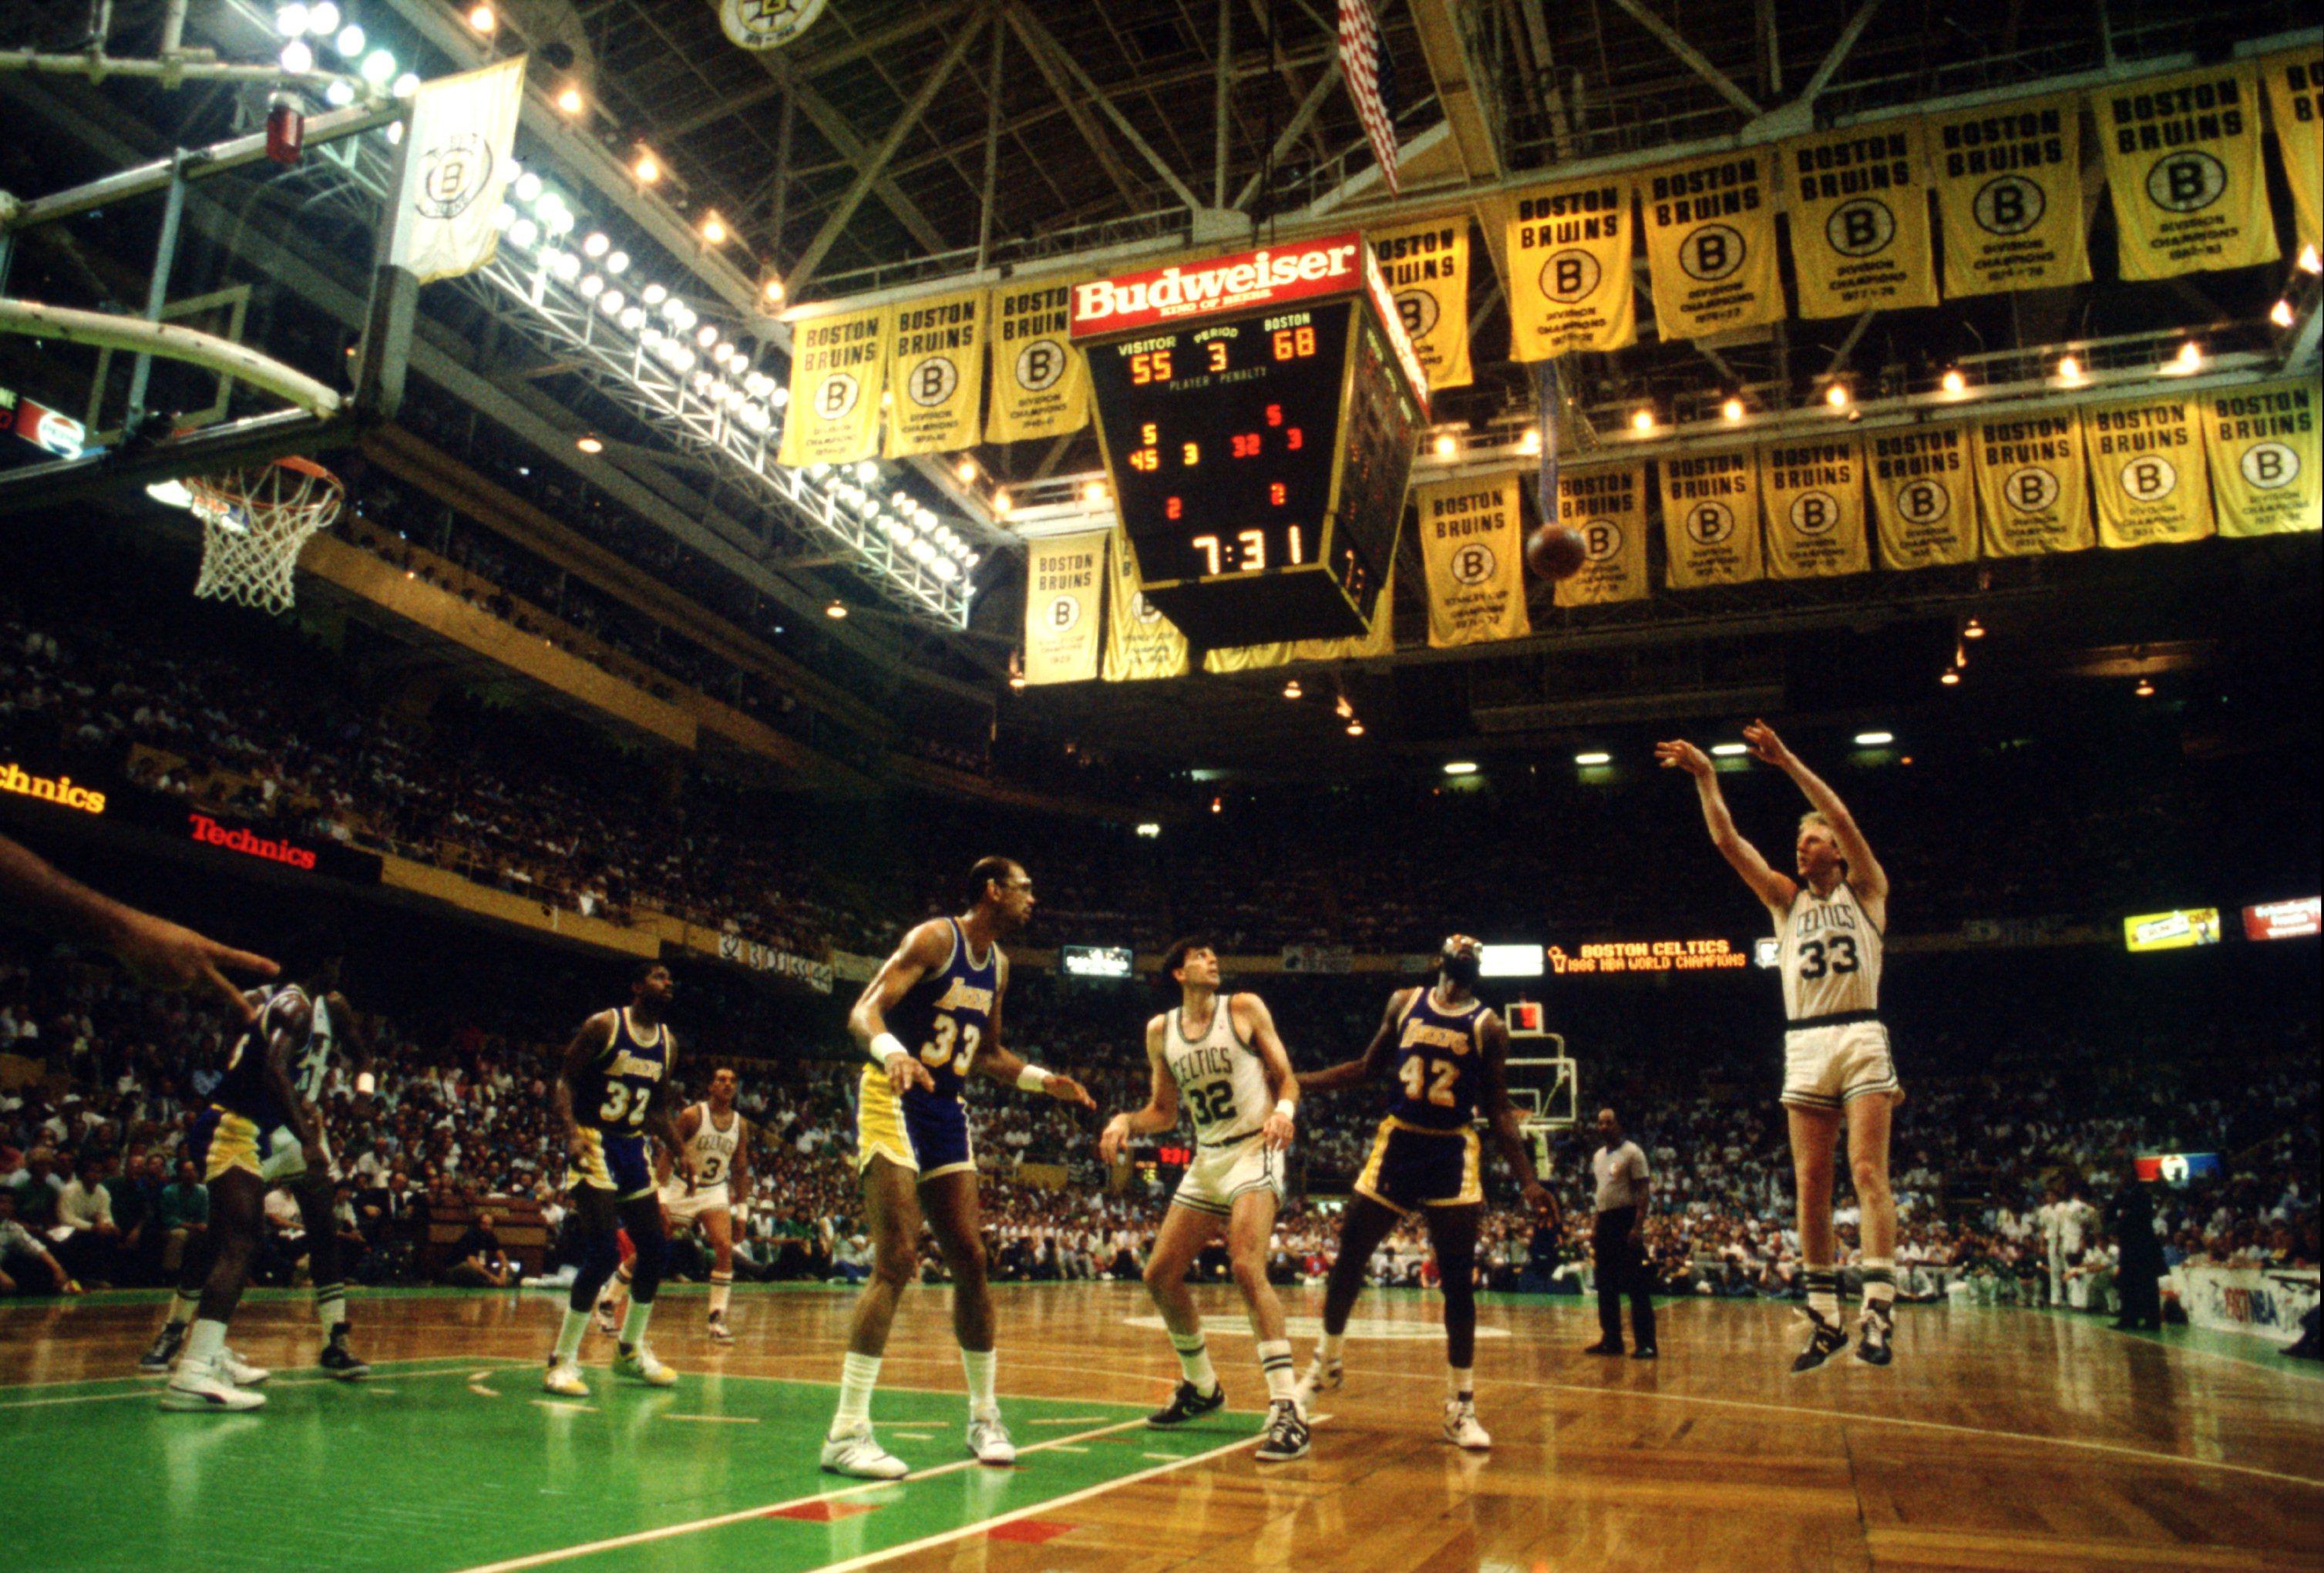 JUN 1987:  BOSTON FORWARD LARRY BIRD SHOOTS A JUMP SHOT DURING THE THIRD QUARTER OF THE CELTICS GAME VERSUS THE LOS ANGELES LAKERS IN THE NBA FINALS AT THE BOSTON GARDEN IN BOSTON, MASSACHUSETTS. Mandatory Credit: Jonathan Daniel/ALLSPORT